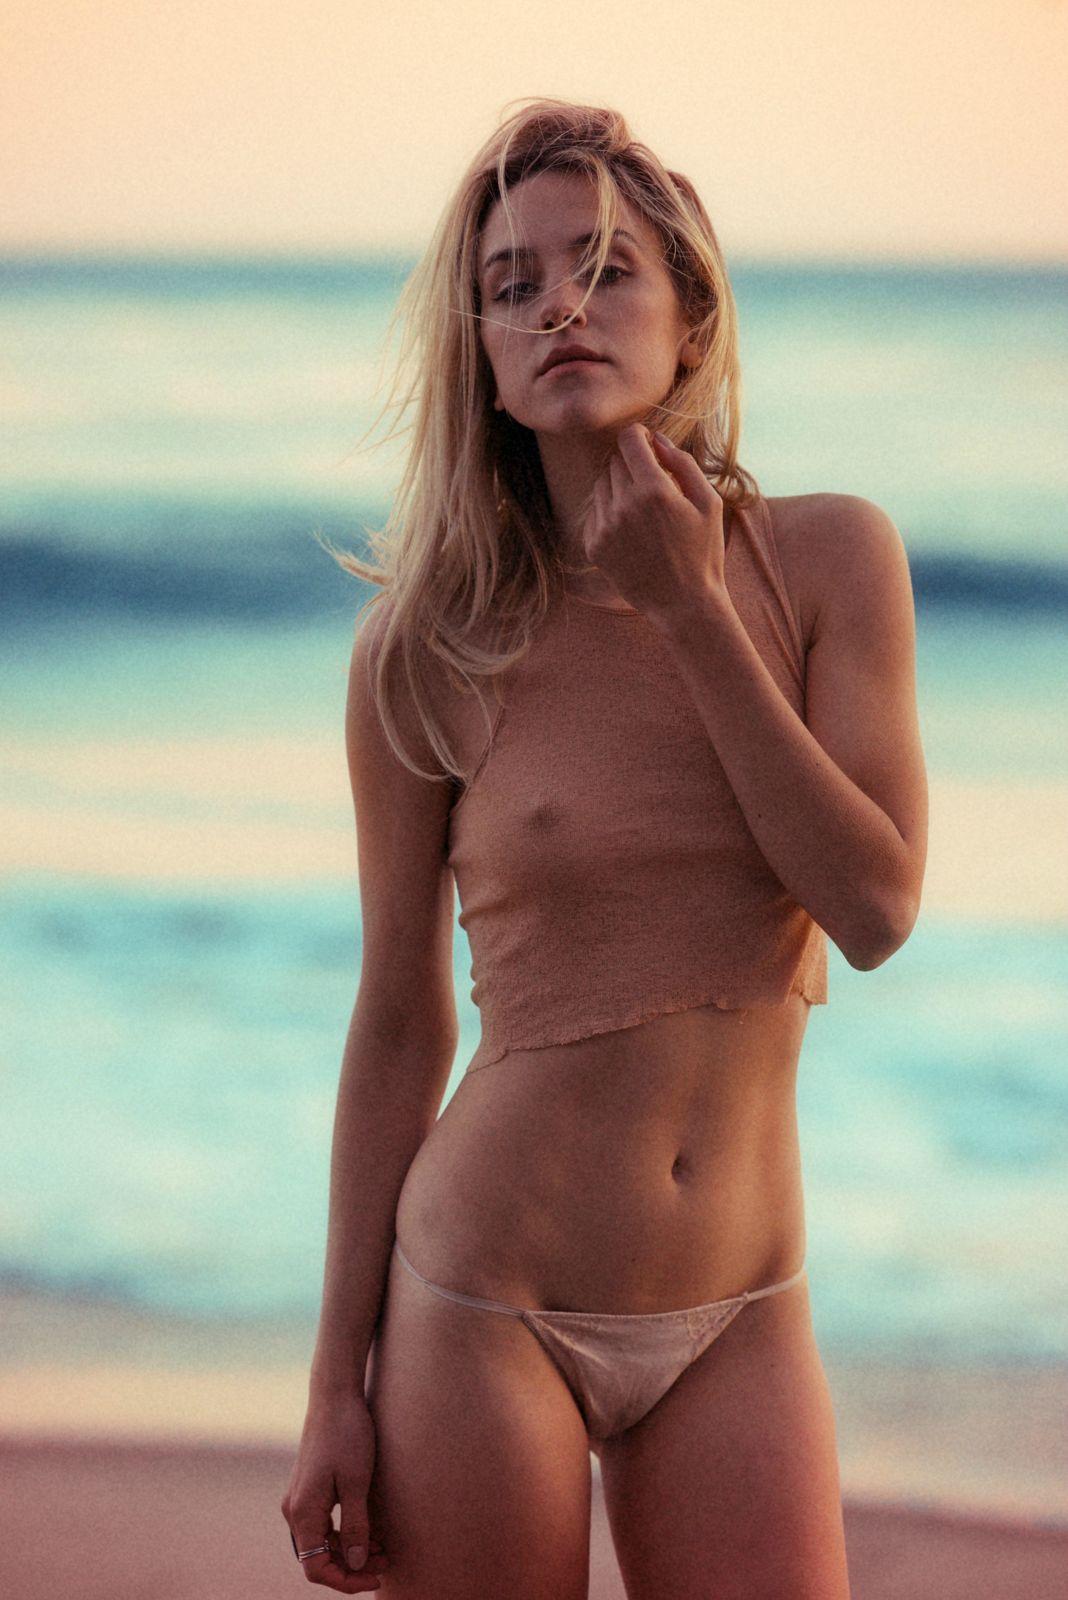 walk Best bikini